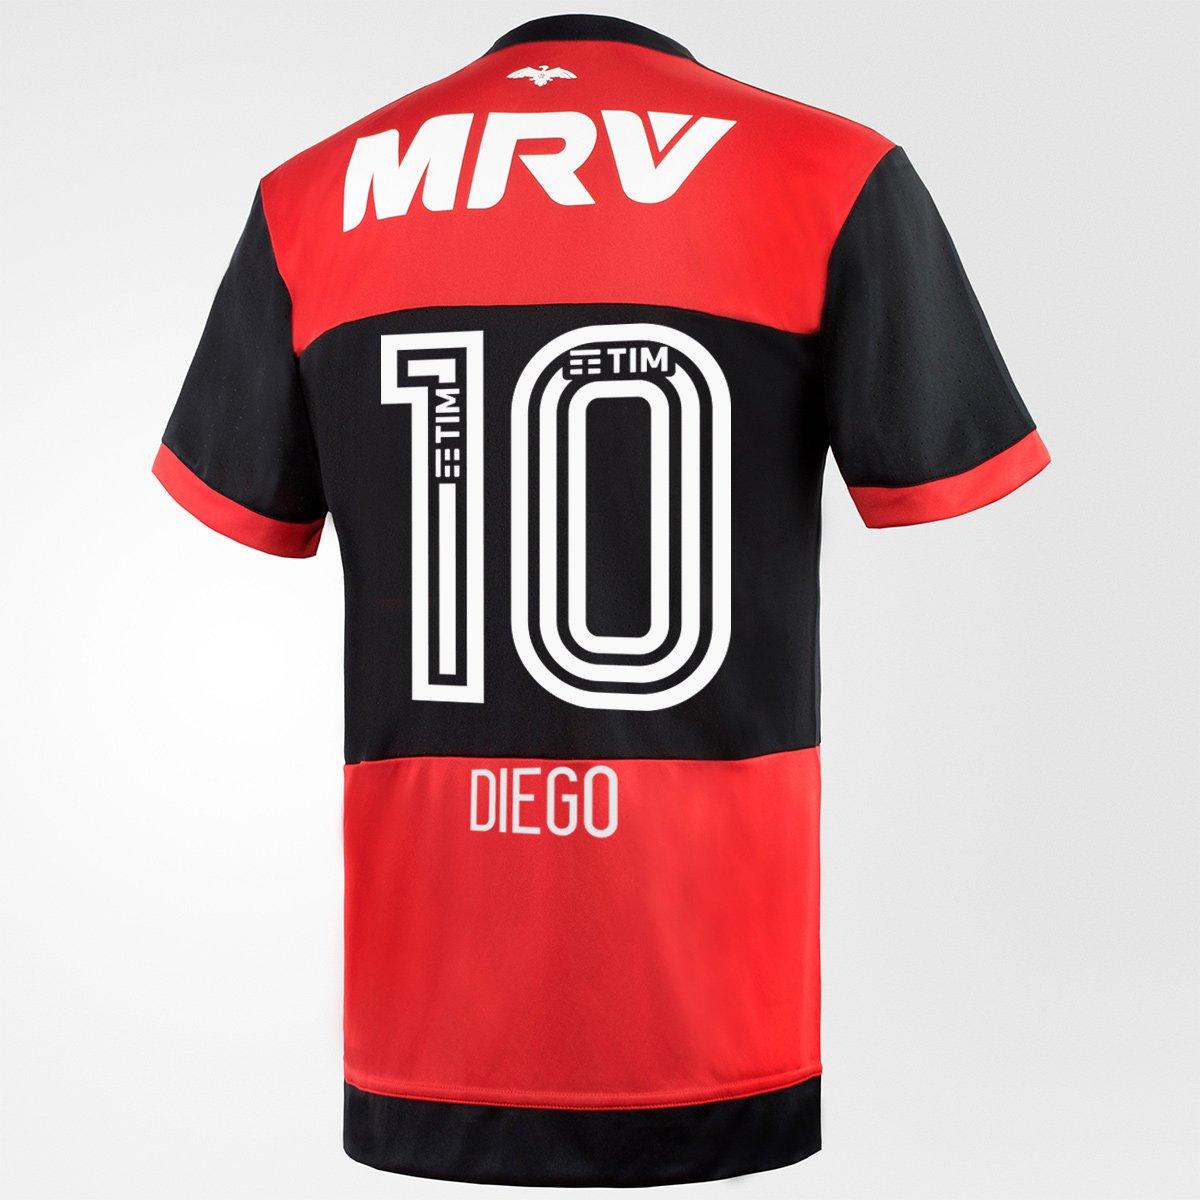 Camisa Flamengo I 17 18 N° 10 - Diego Torcedor Adidas Masculina - Compre  Agora  1a683bf6b1c5a